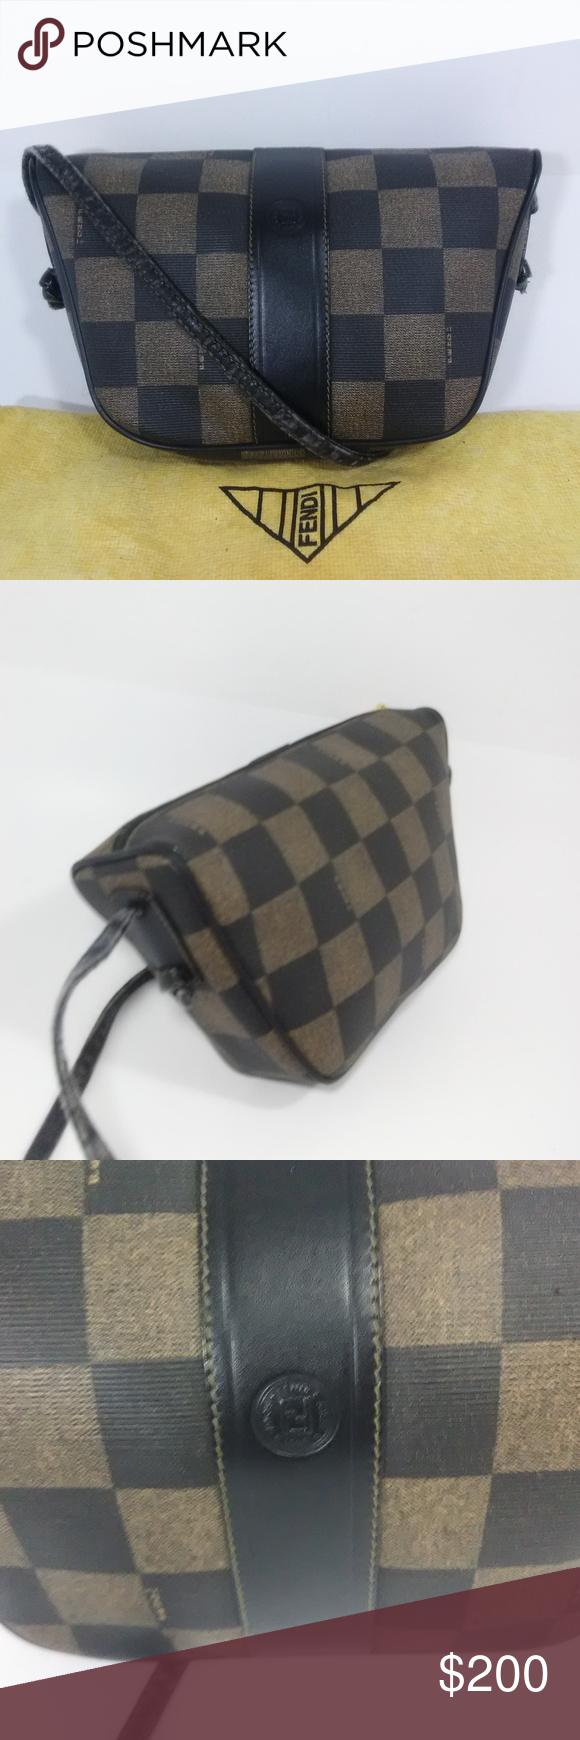 efbd525416 FENDI Vintage Roma Checkered Print Crossbody Bag FENDI Roma Italy 1925  S.A.S Checkered Print Crossbody Bag